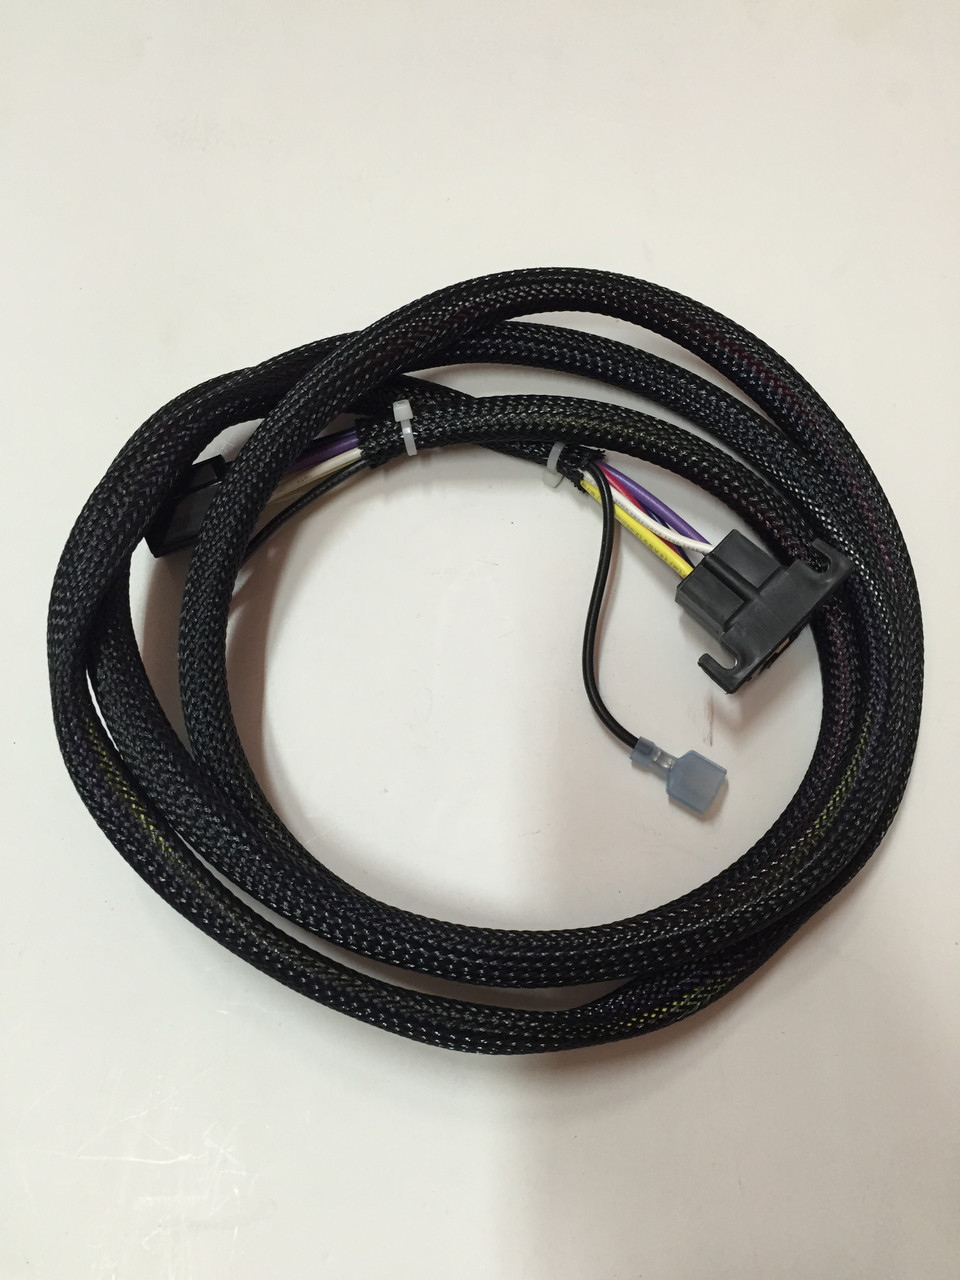 hight resolution of kohler key switch wiring harness extension 6 for all kohler gas kohler ignition switch